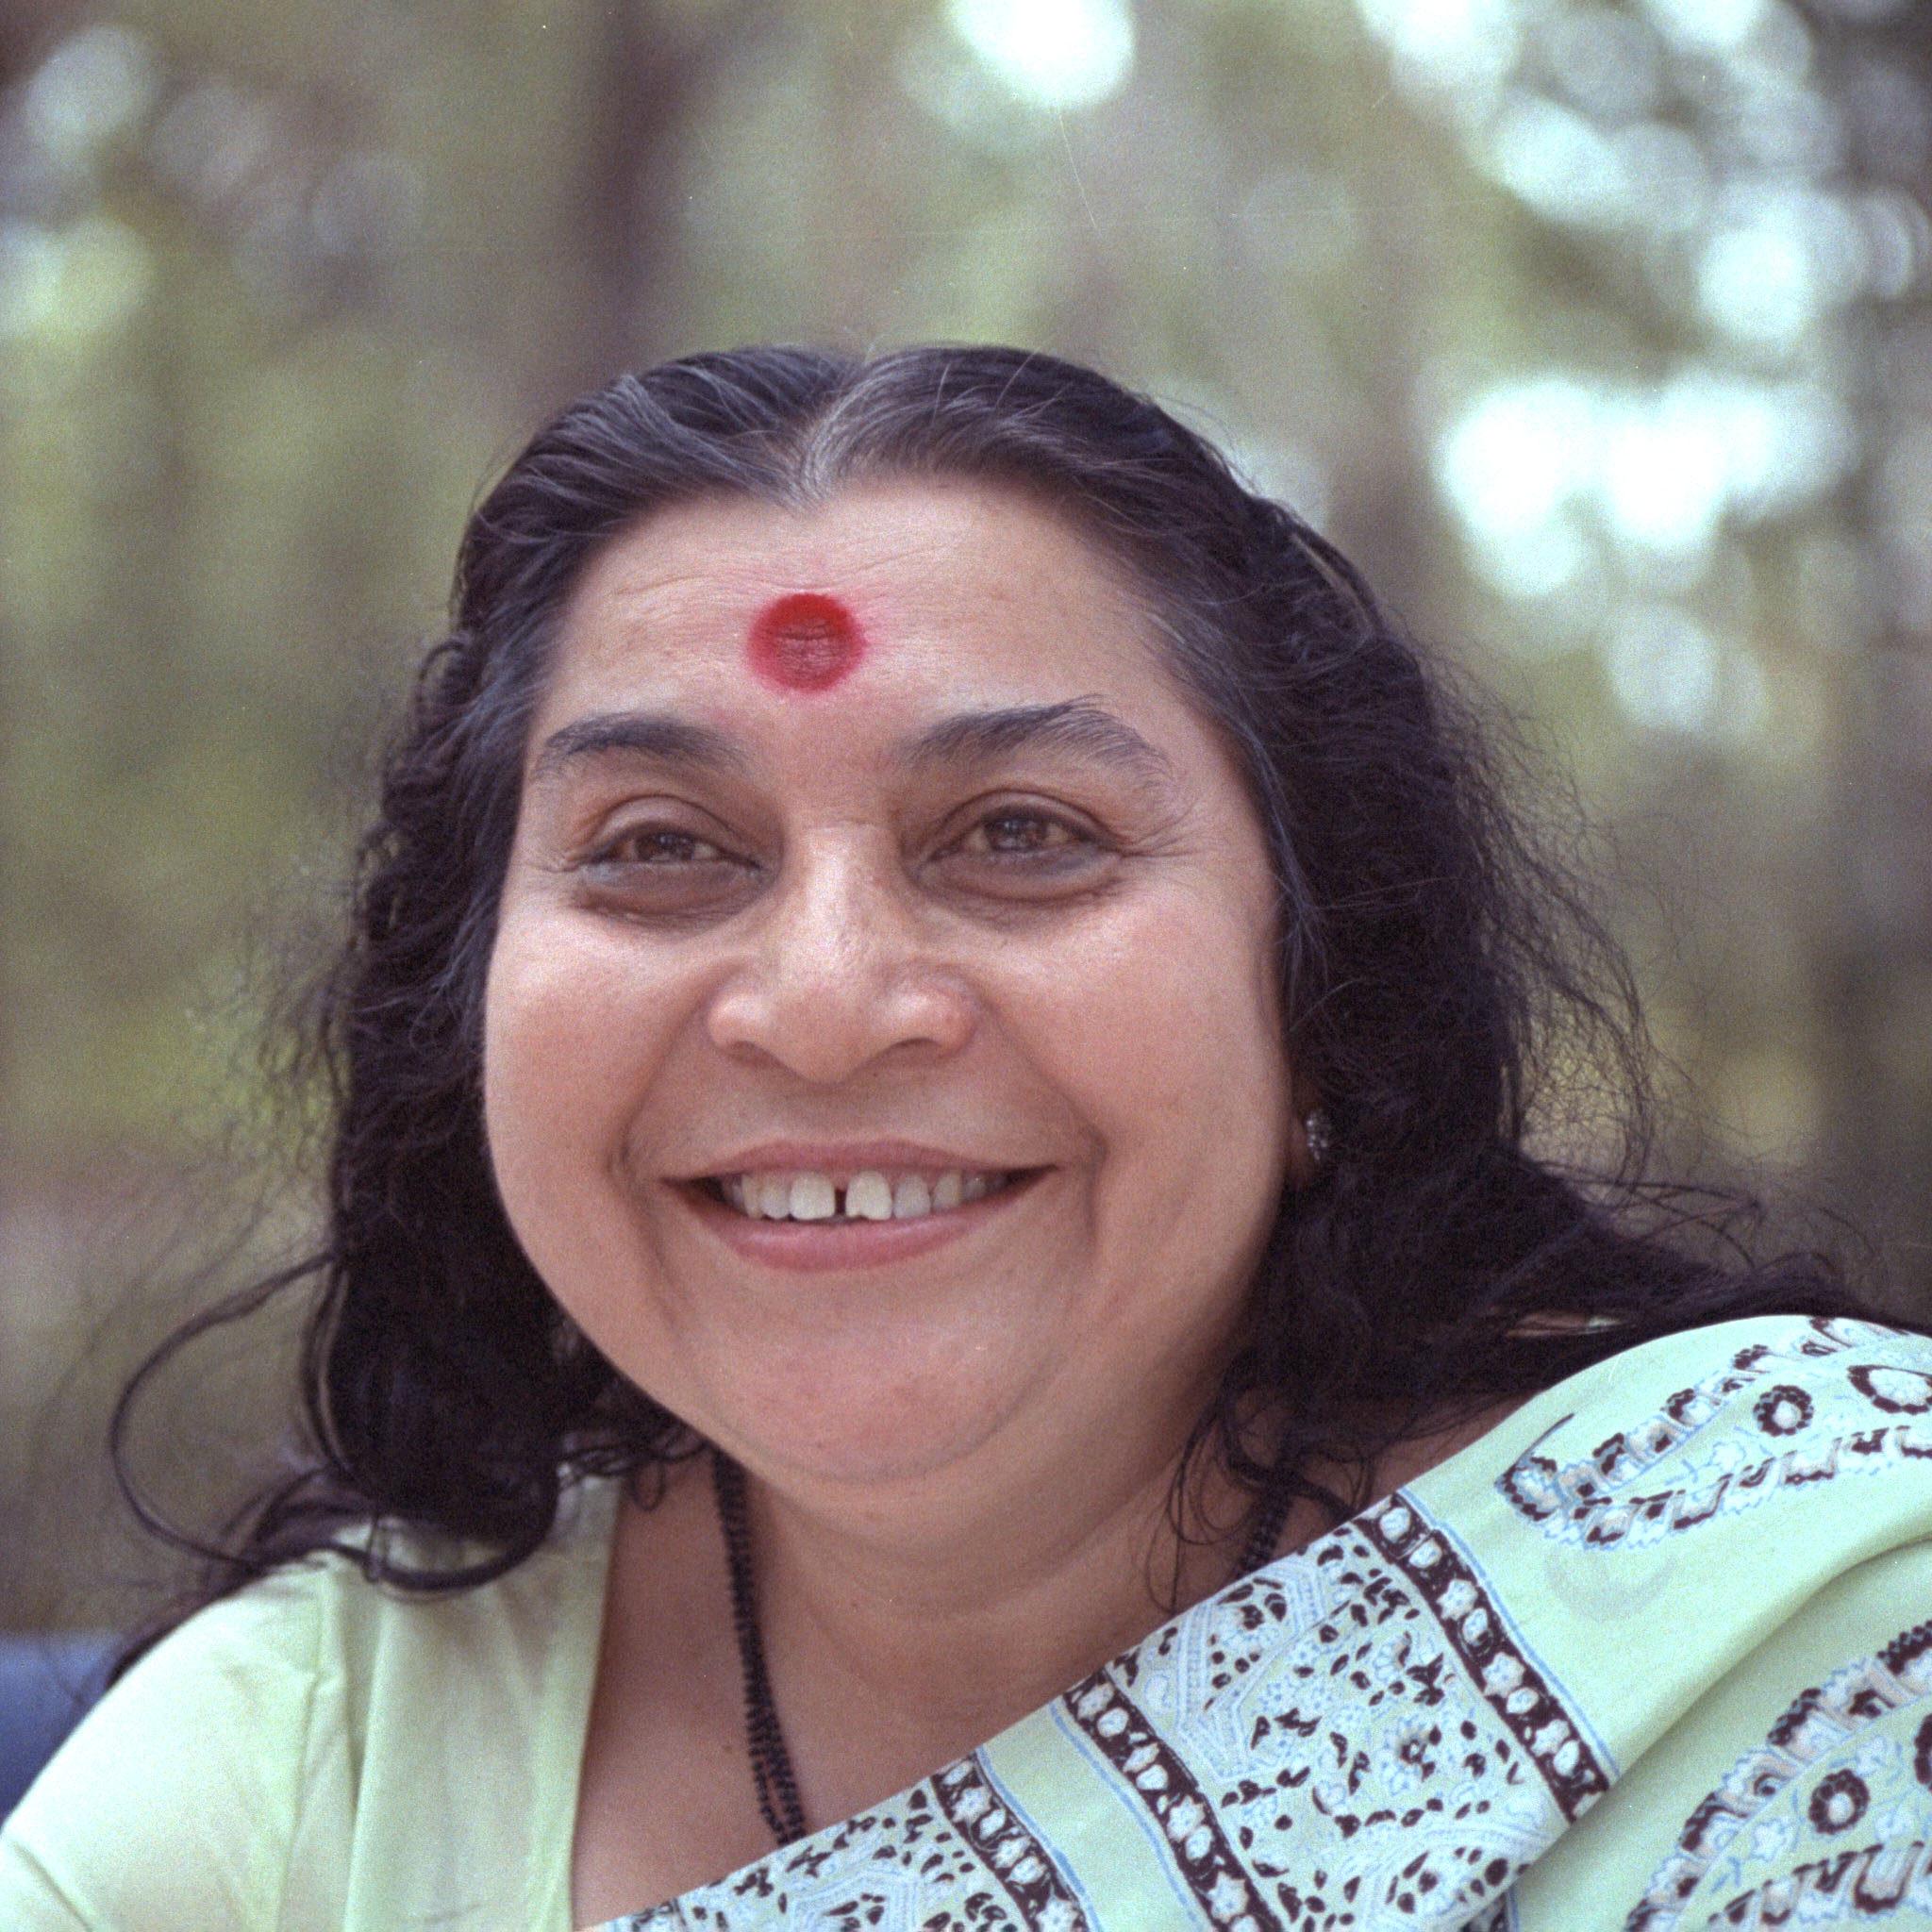 Shree Mataji Nirmala Devi